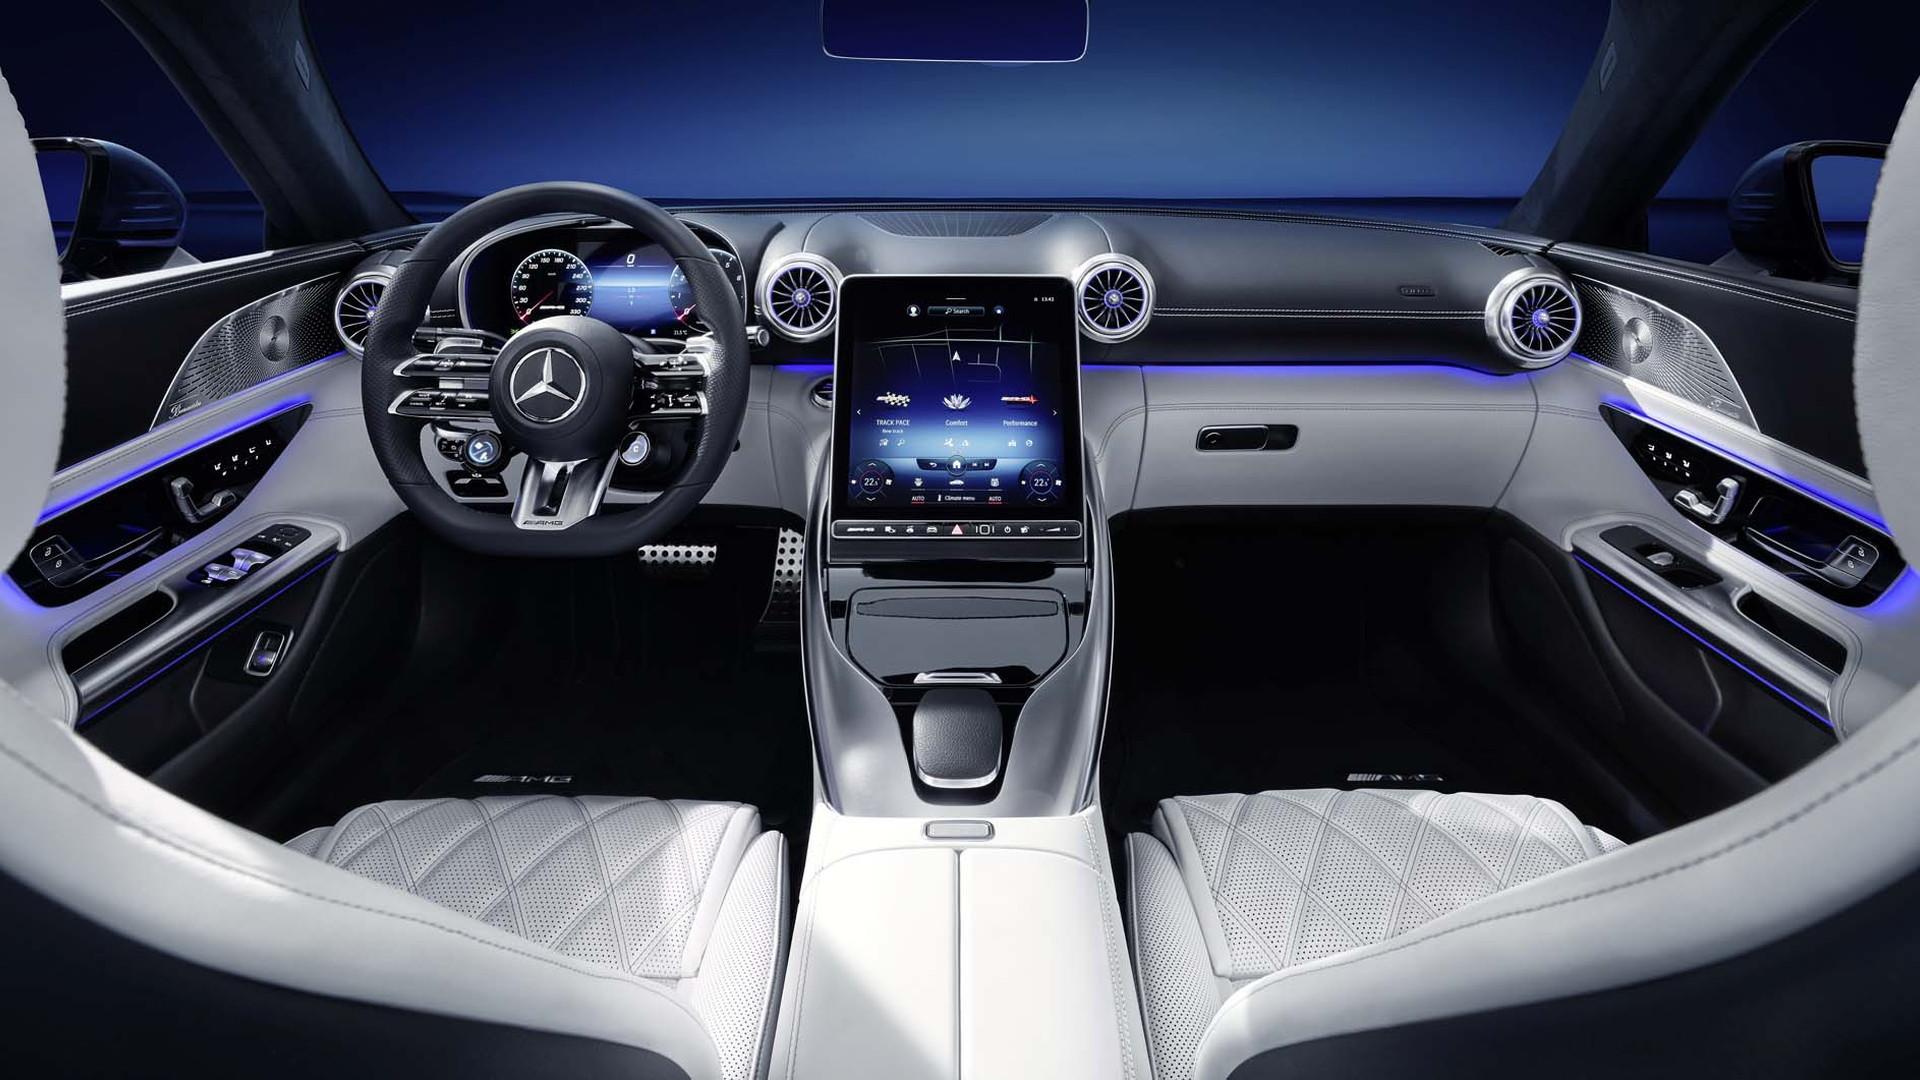 2022 Mercedes-Benz AMG SL Roadster